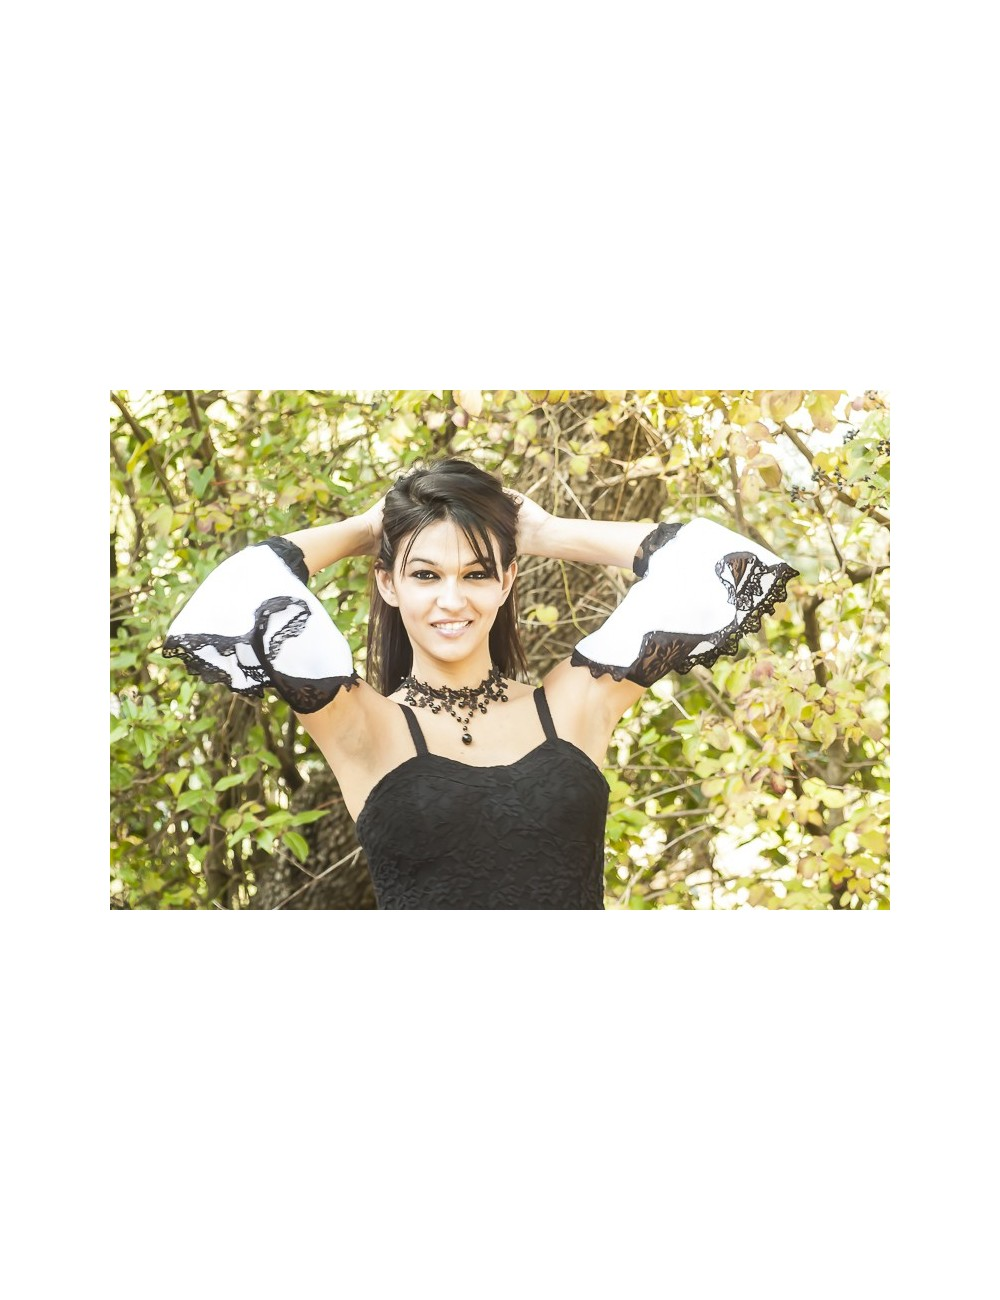 Bijoux de bras en dentelle flamenco